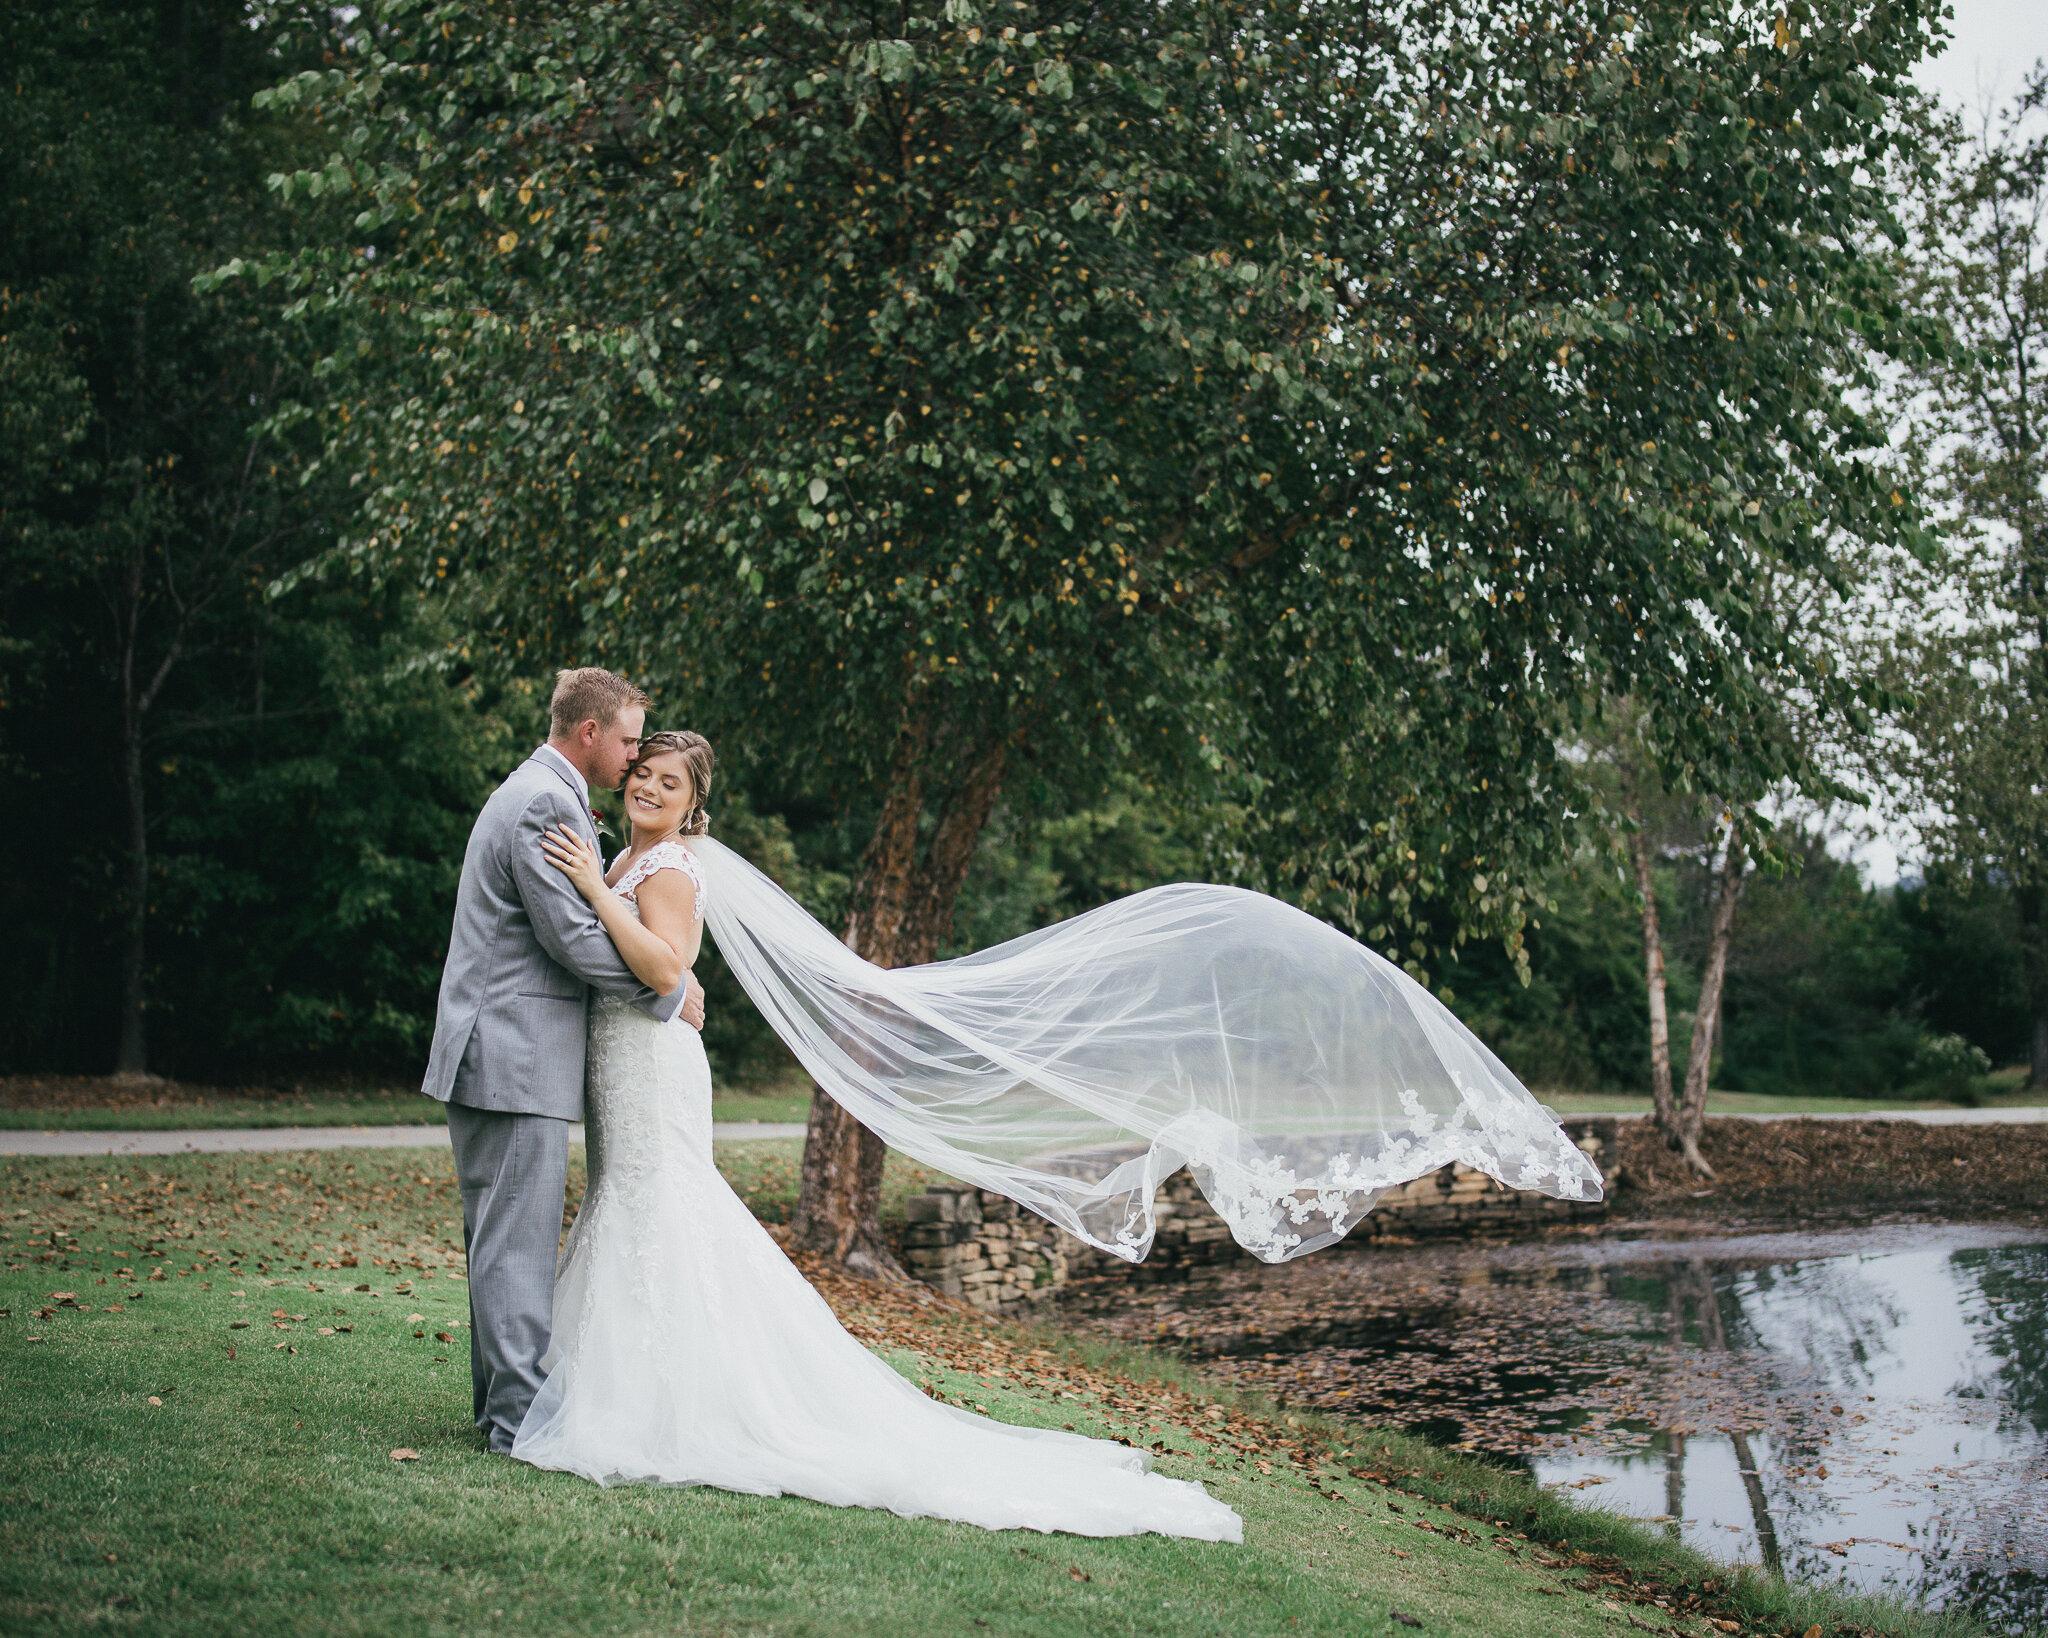 lux amore chattanooga wedding photographer cleveland wedding photography